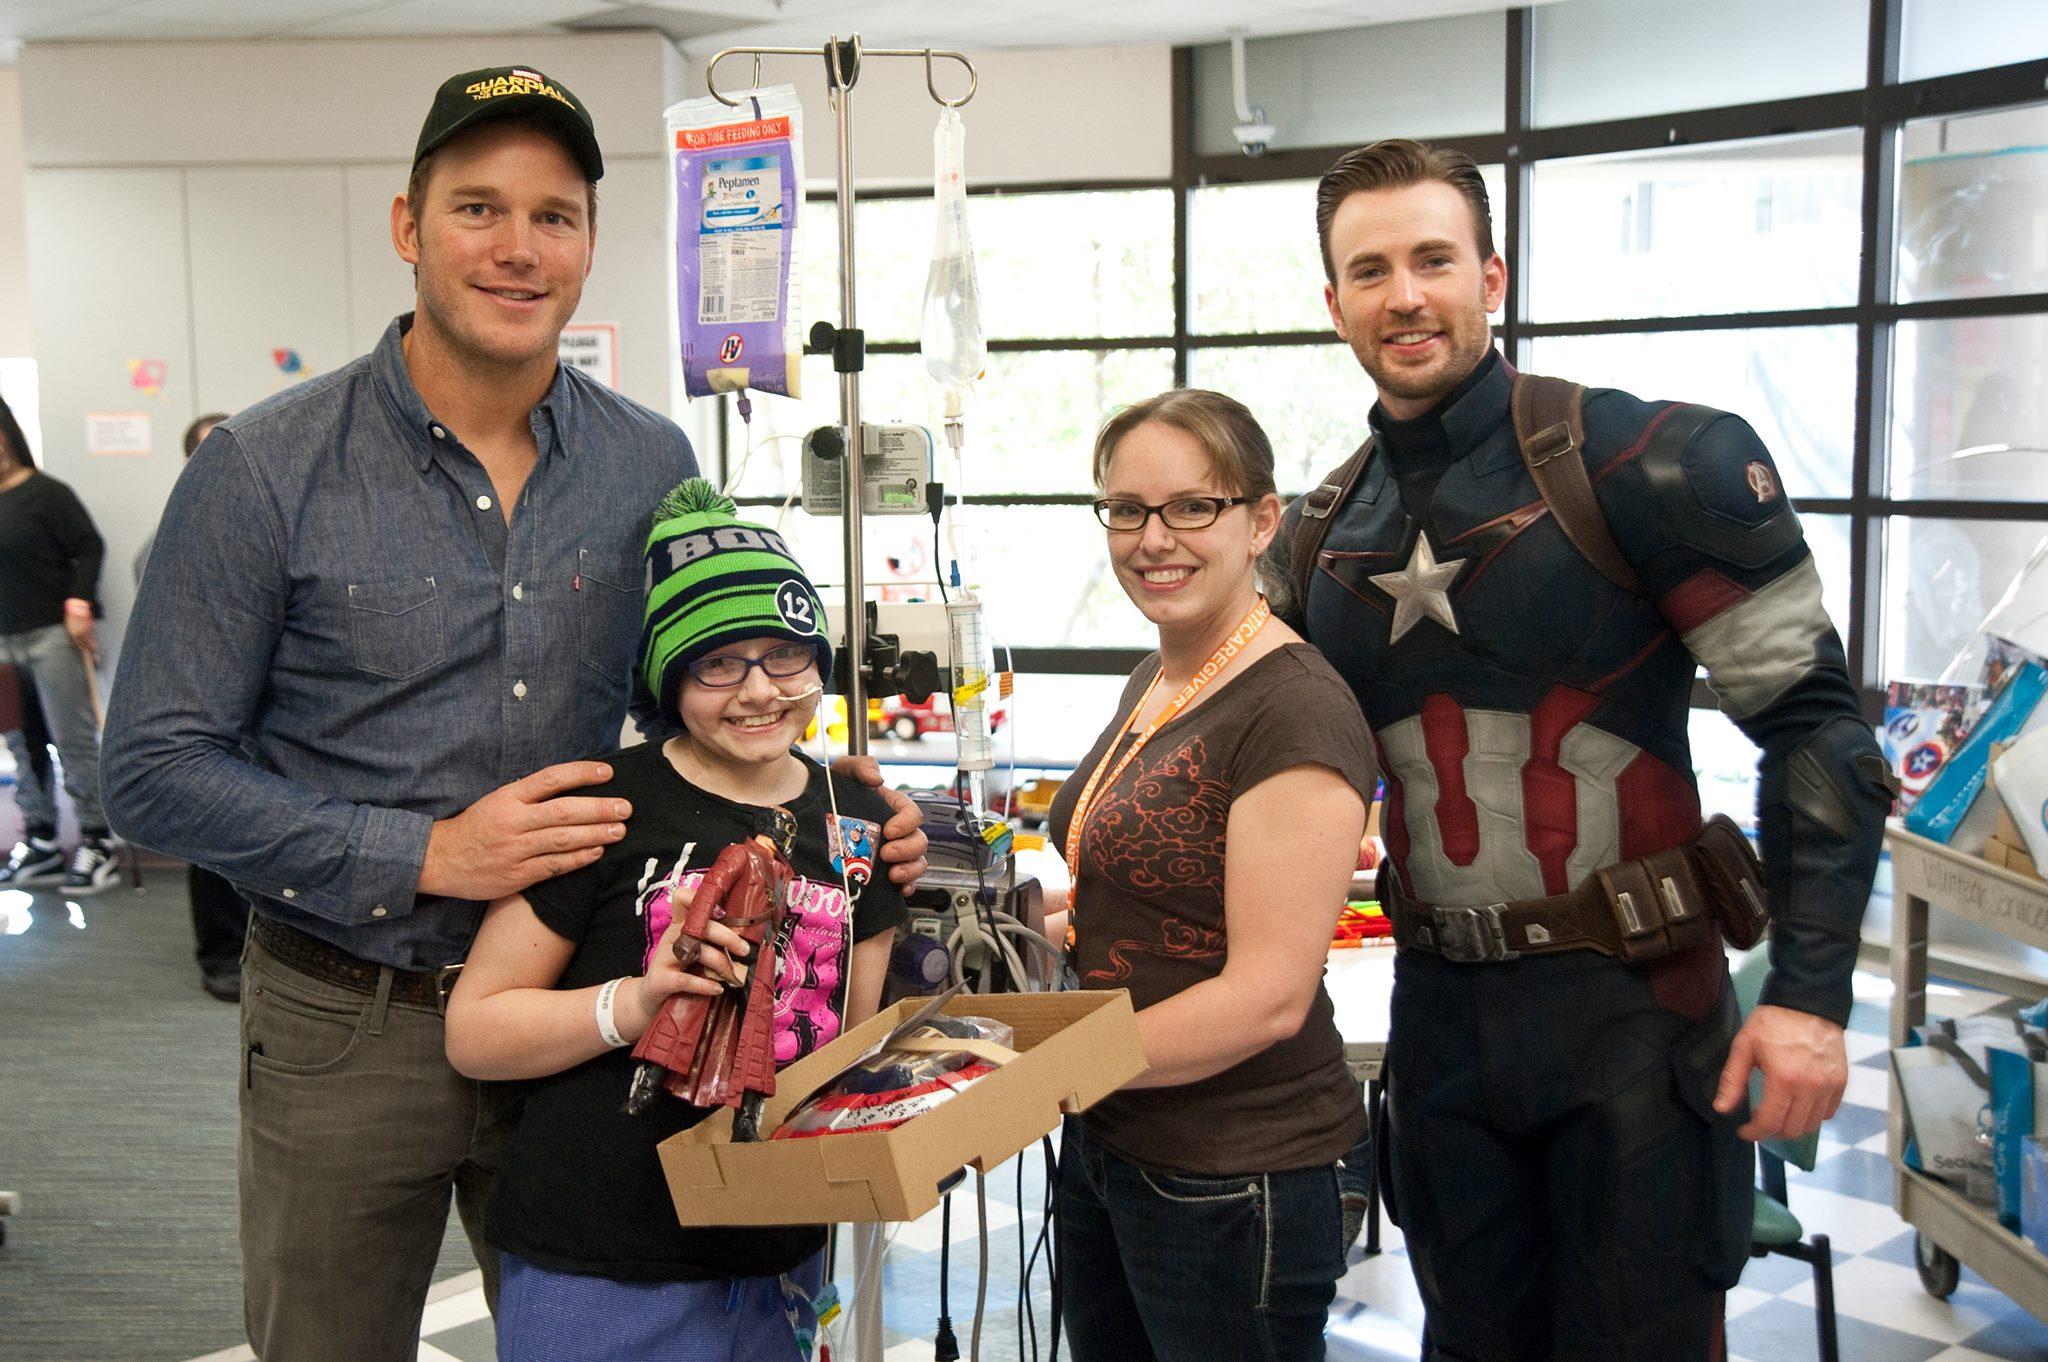 Captain-America-Star-Lord-Hopitaux-Enfants-4